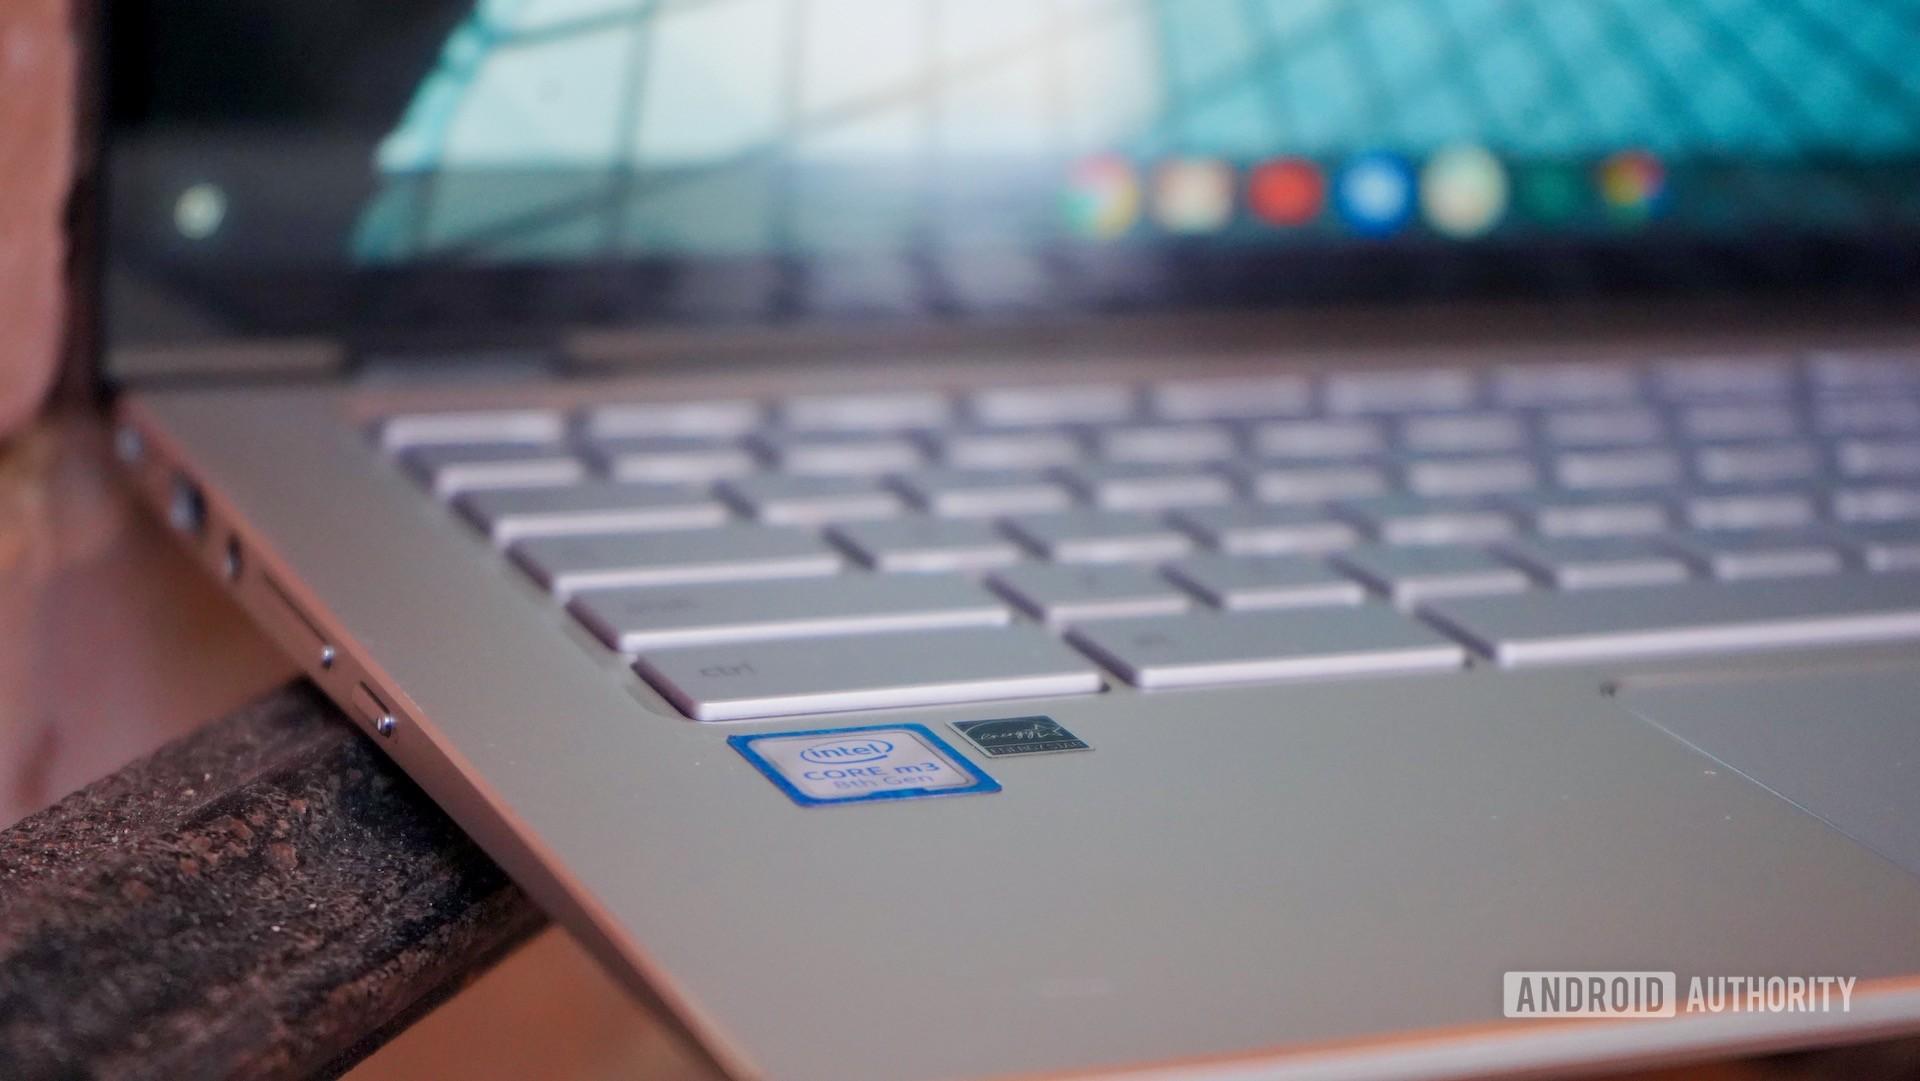 Asus Chromebook Flip C434 review: A worthy successor